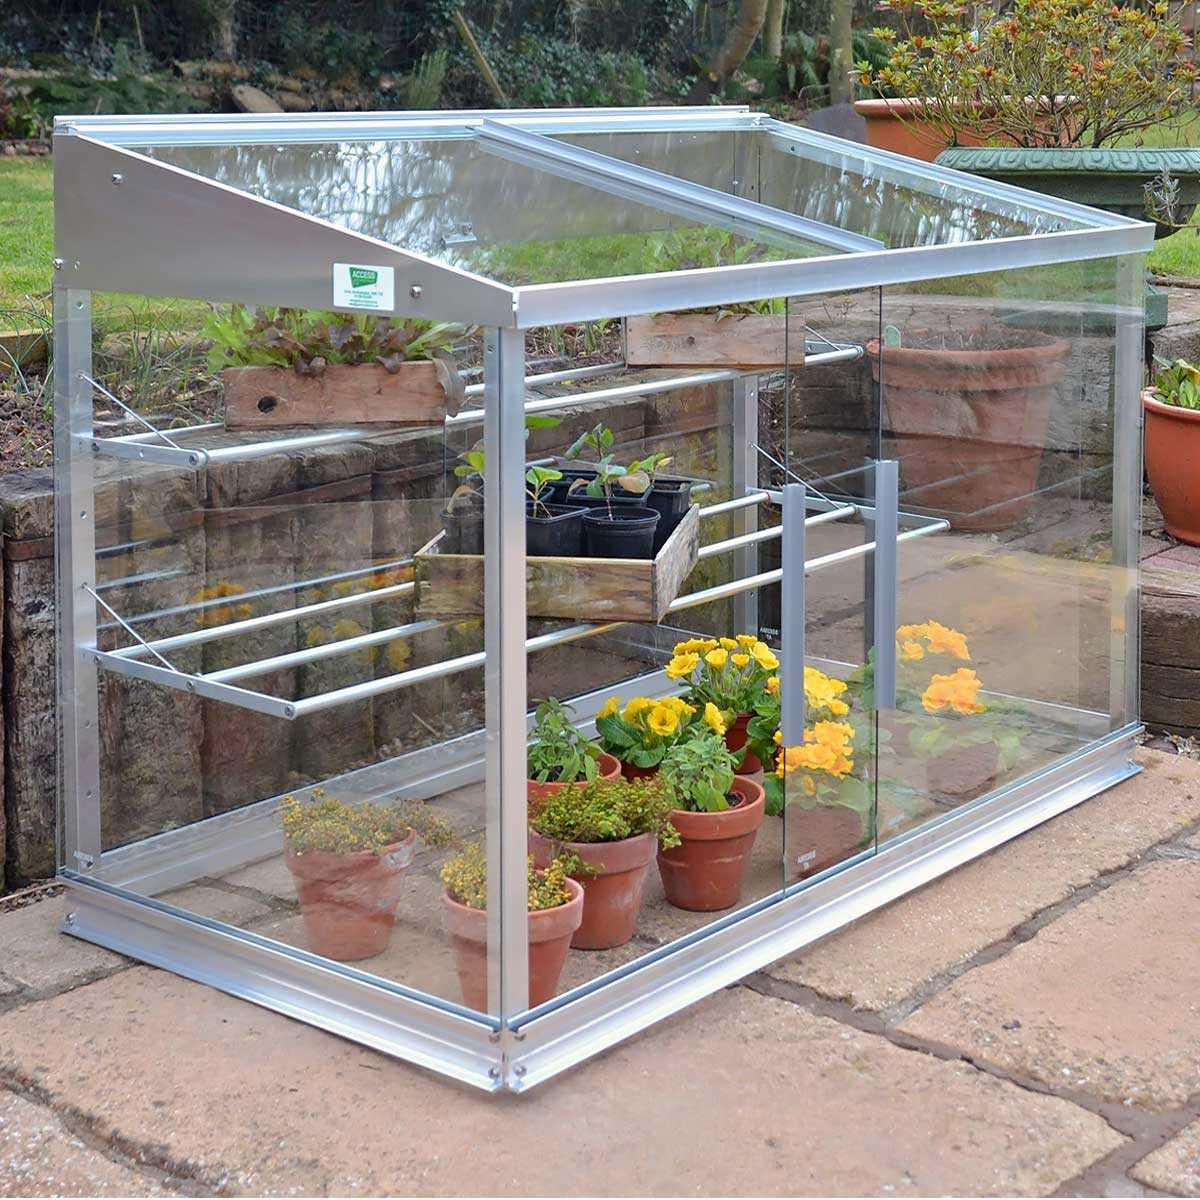 Mini Serre En Verre Et Aluminium 0.80M2 dedans Fabriquer Une Mini Serre De Jardin